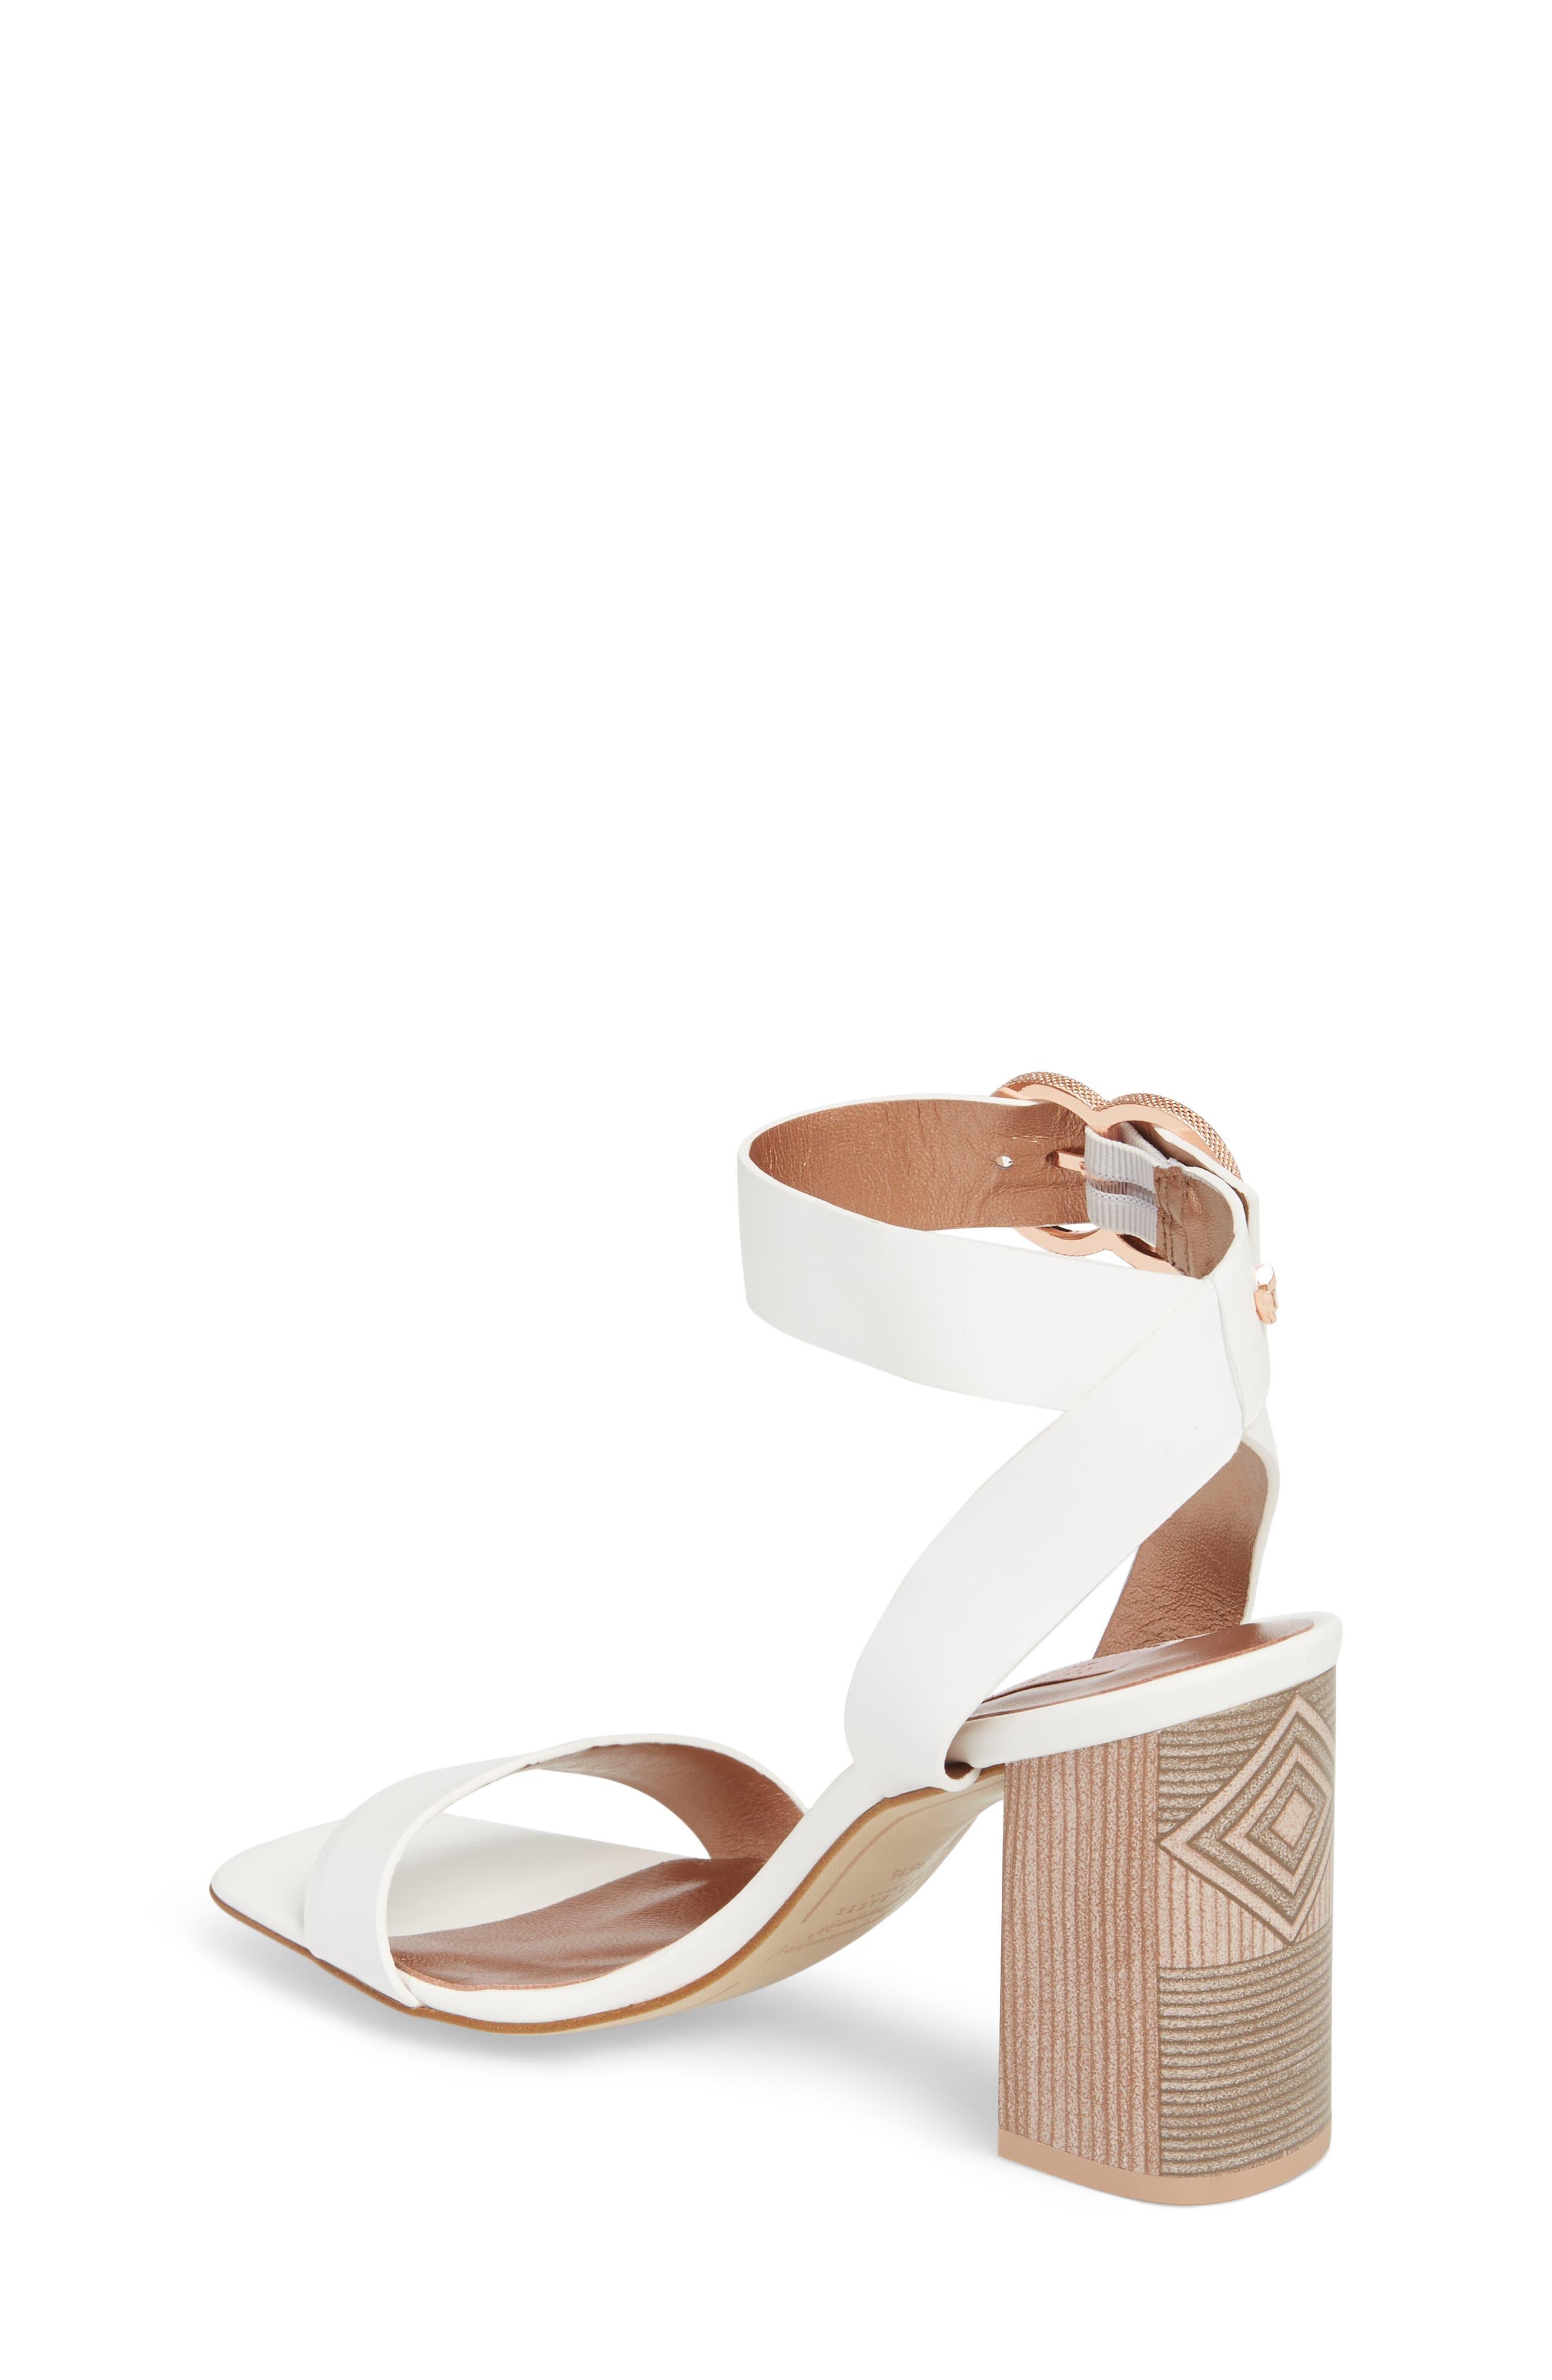 Vallama Block Heel Sandal,                             Alternate thumbnail 2, color,                             White Leather